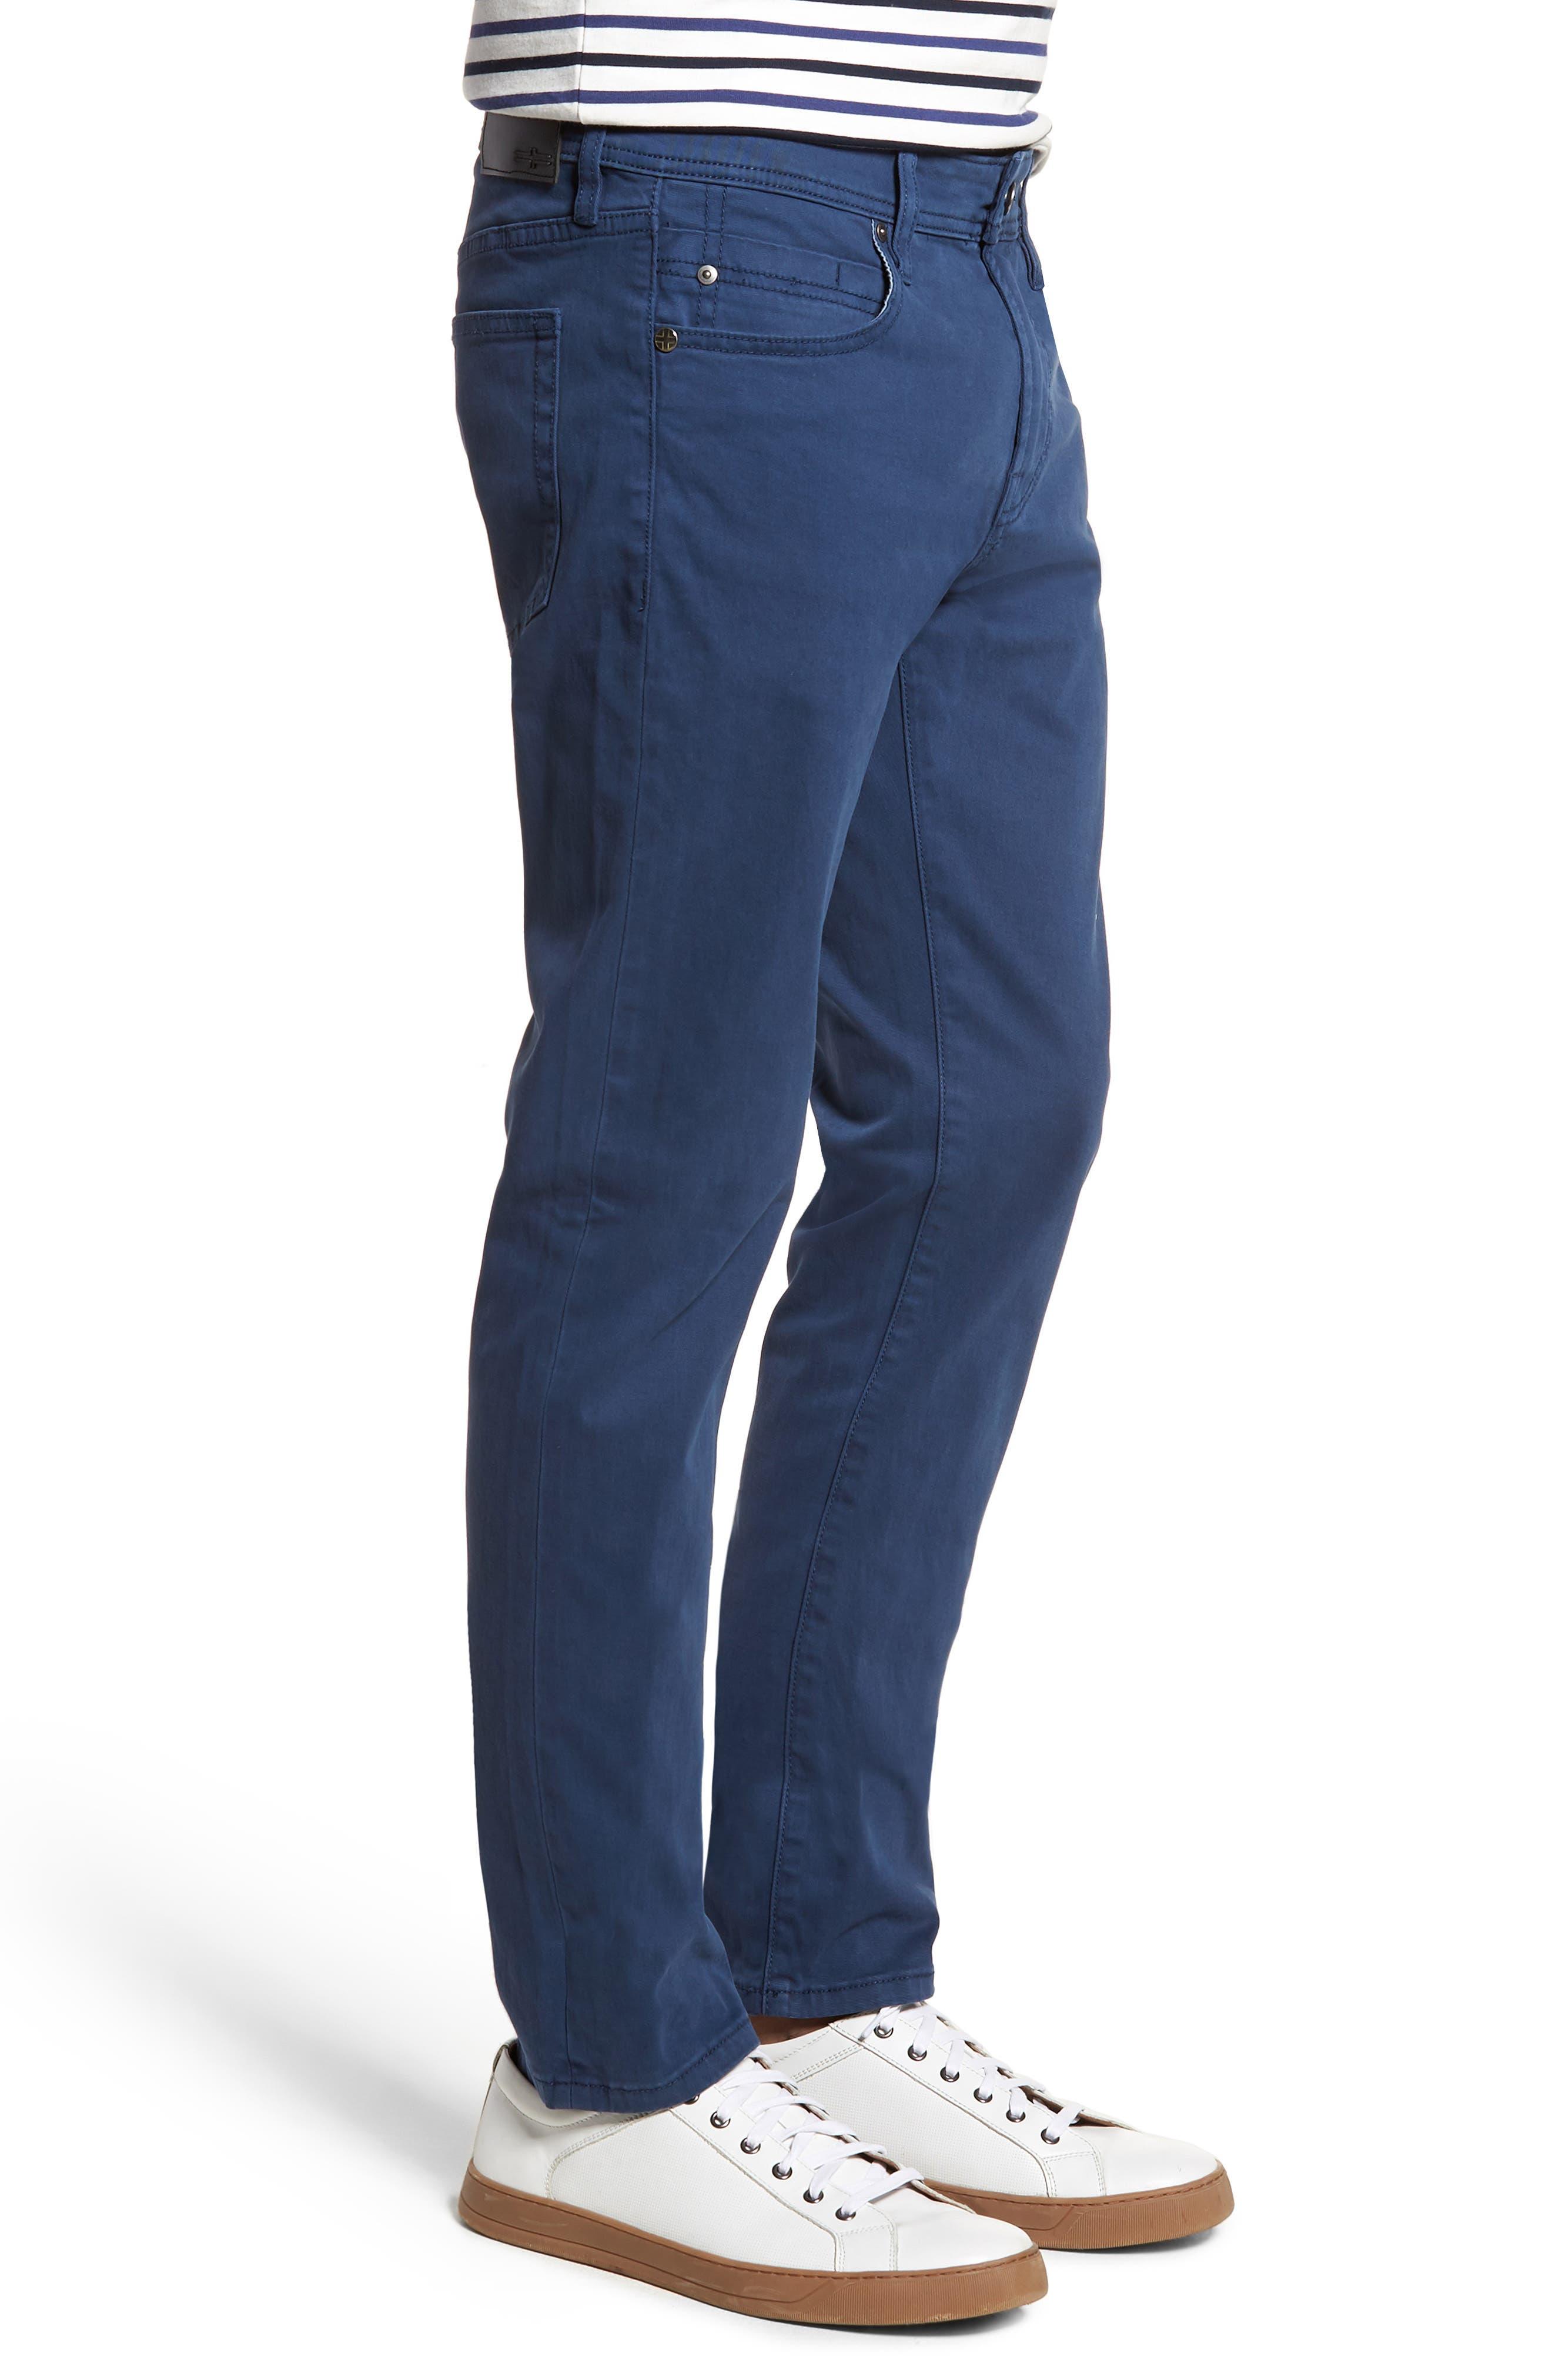 Jeans Co. Kingston Slim Straight Leg Jeans,                             Alternate thumbnail 3, color,                             BLUE TWILIGHT